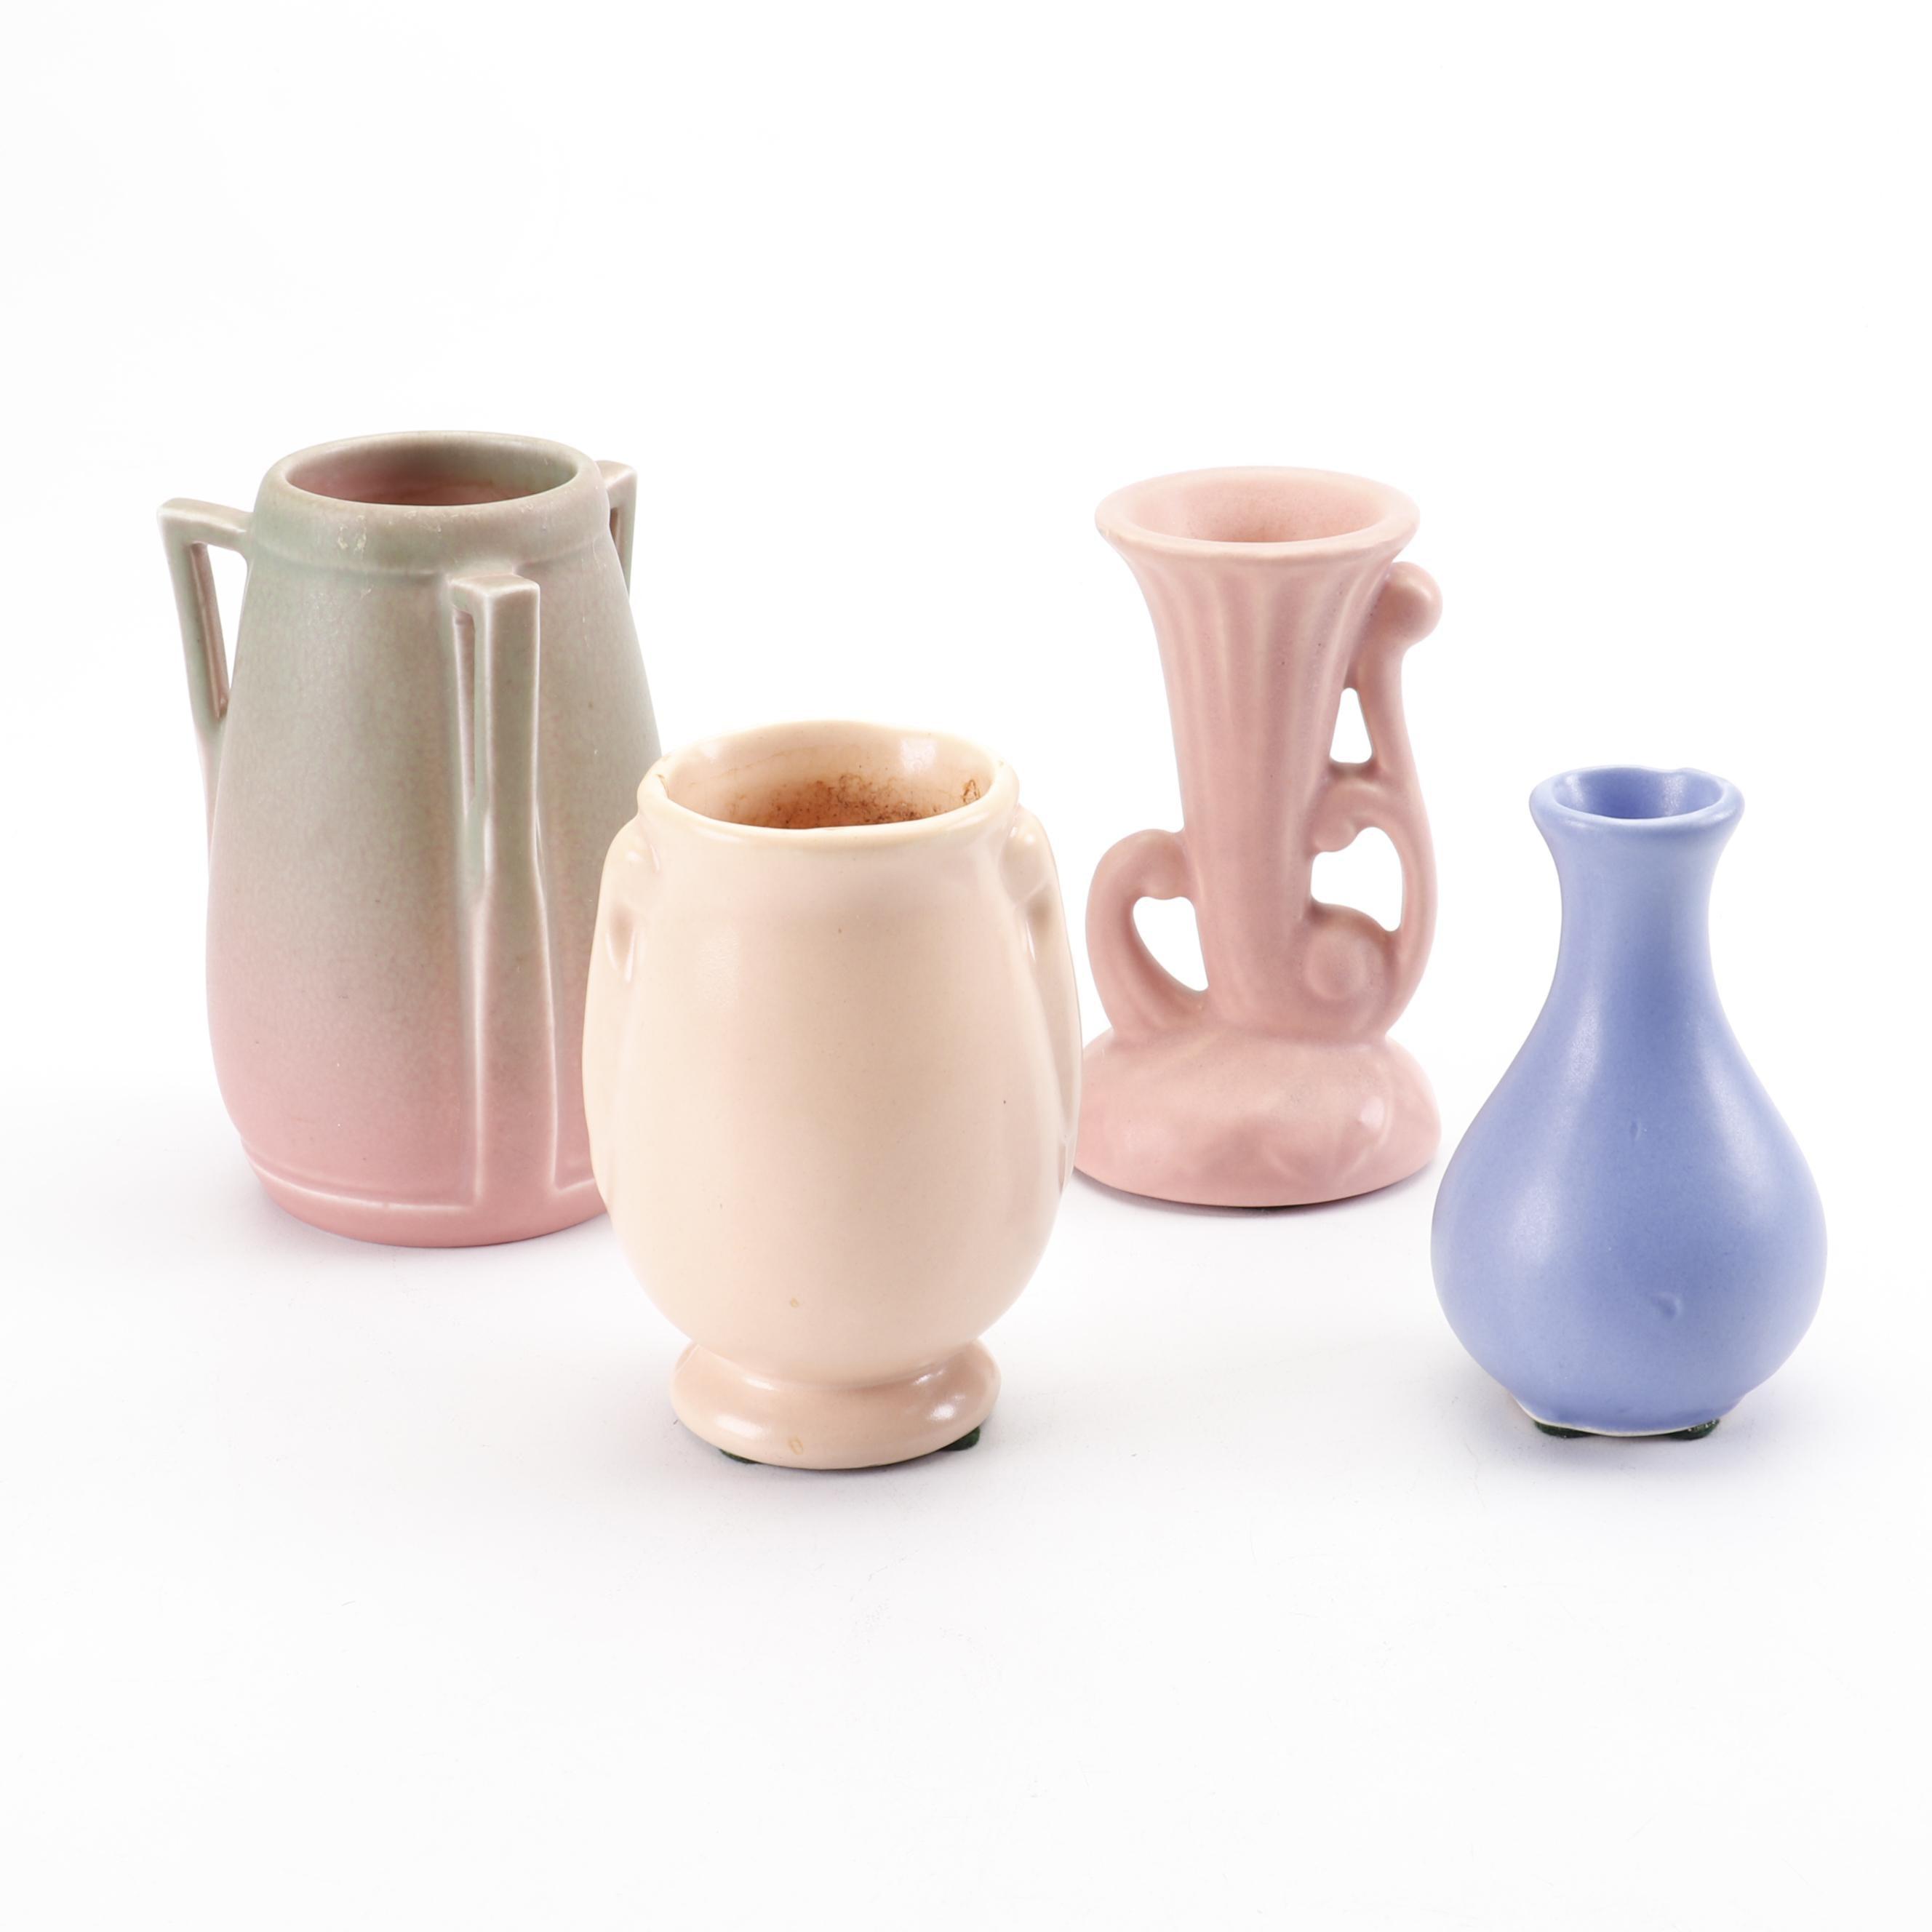 Rookwood Pottery 1927 Art Deco Handled Vase with Mid-Century Flower Vases